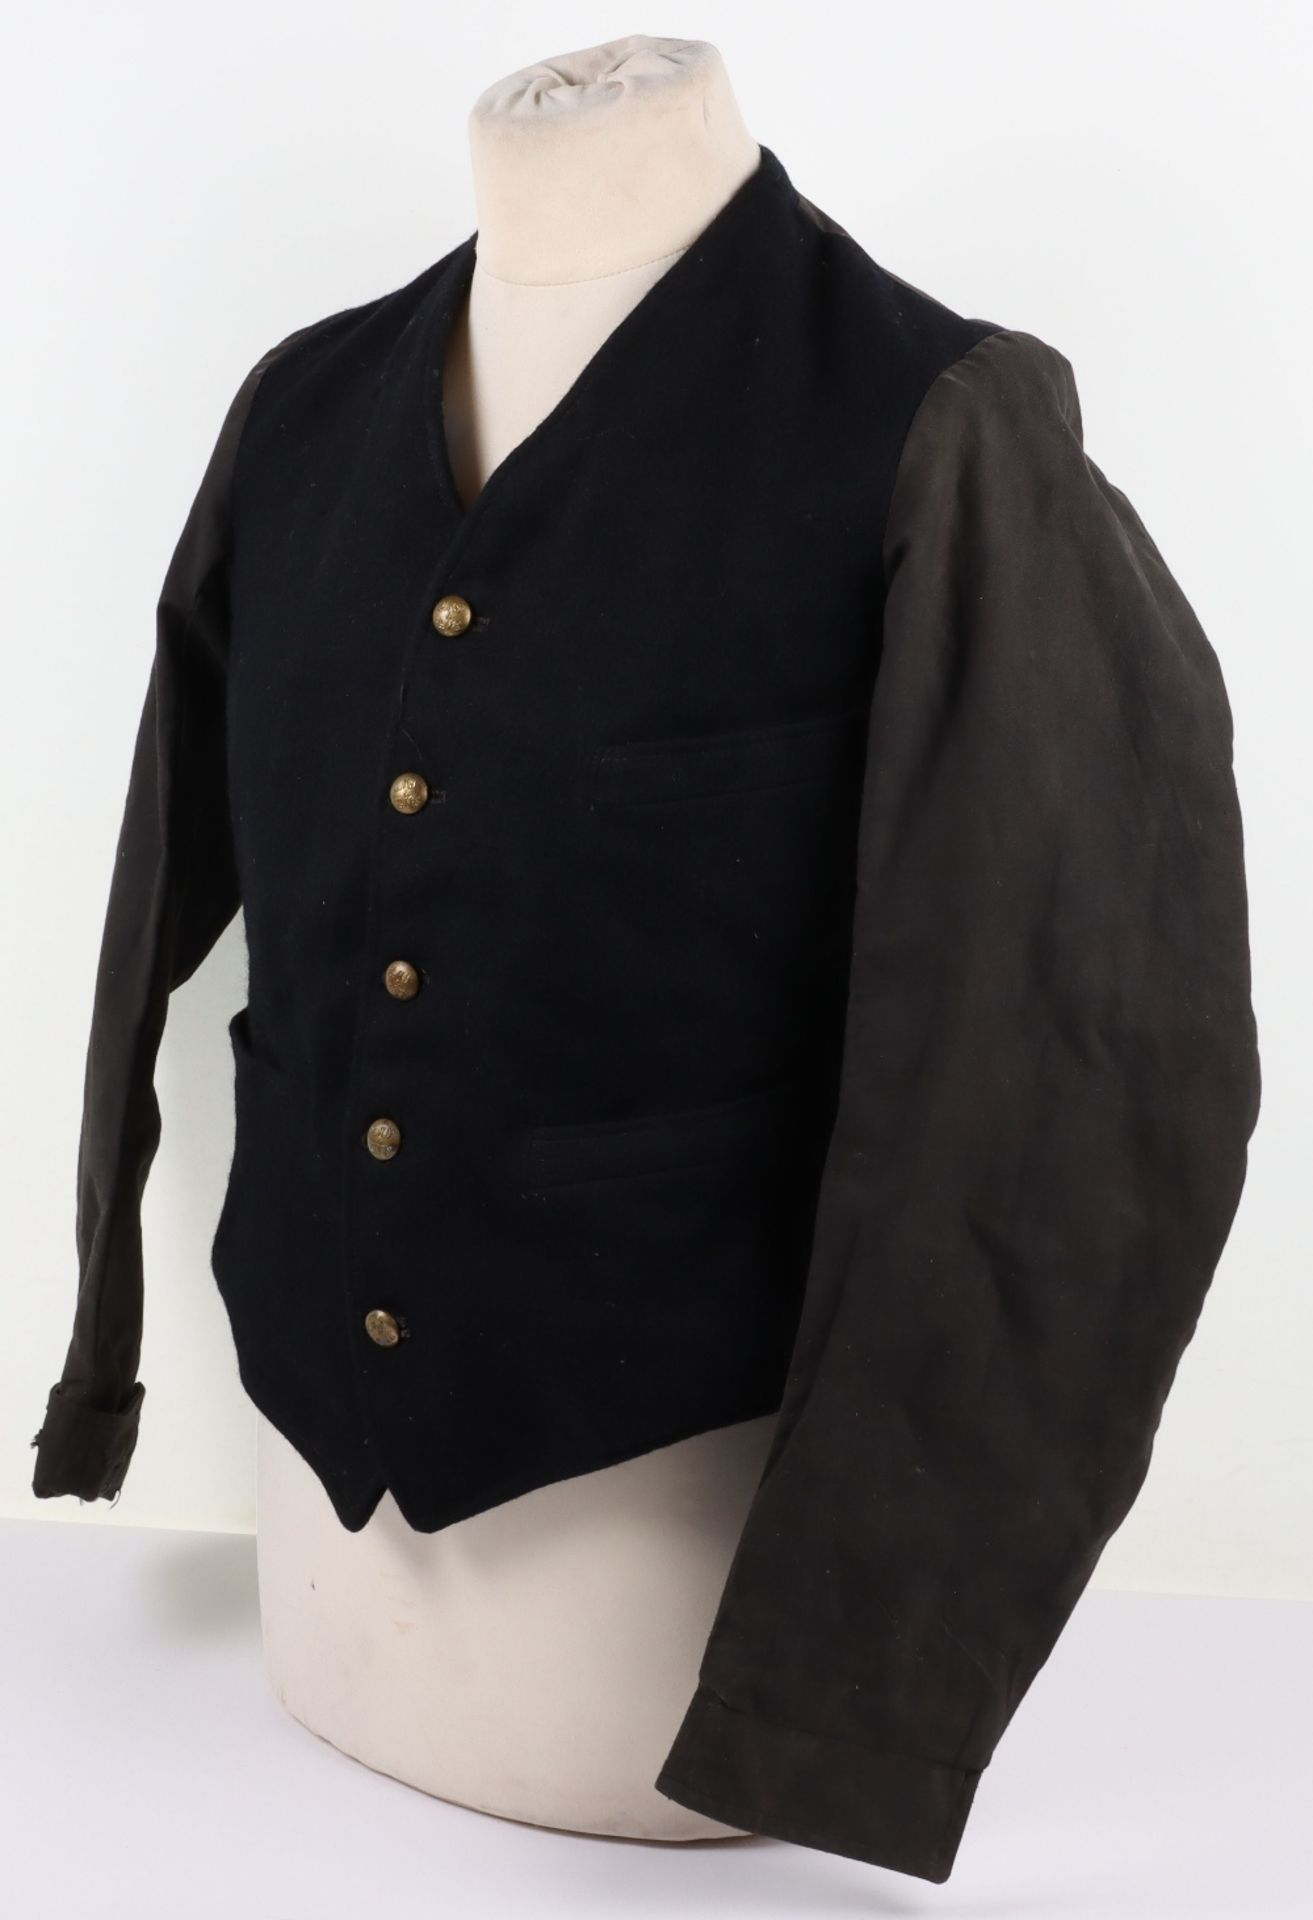 A London, Midland & Scottish and London North Eastern Railway porter's jacket, circa 1930 - Image 5 of 13